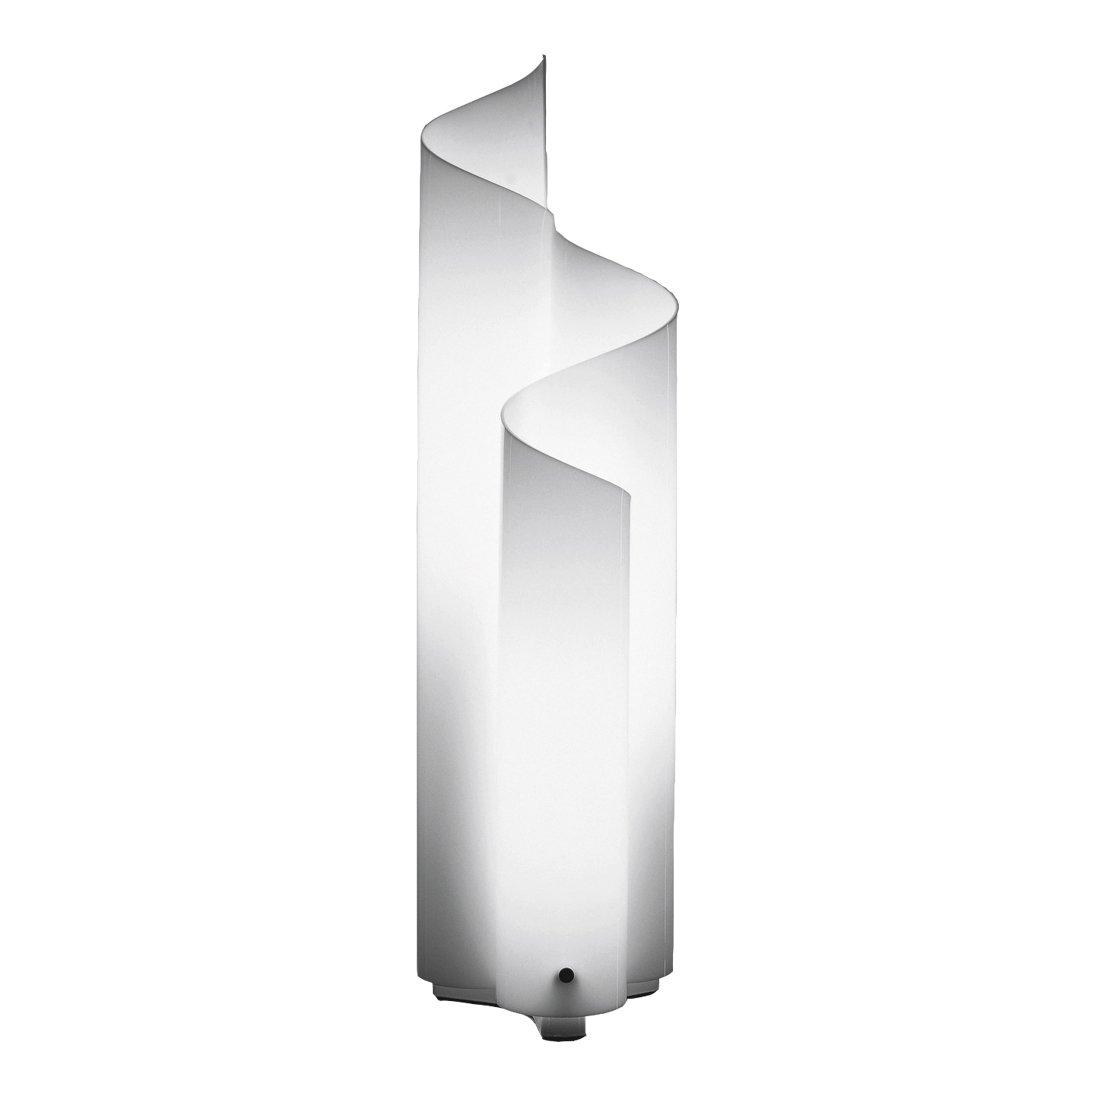 Artemide Mezzachimera Tafellamp Wit